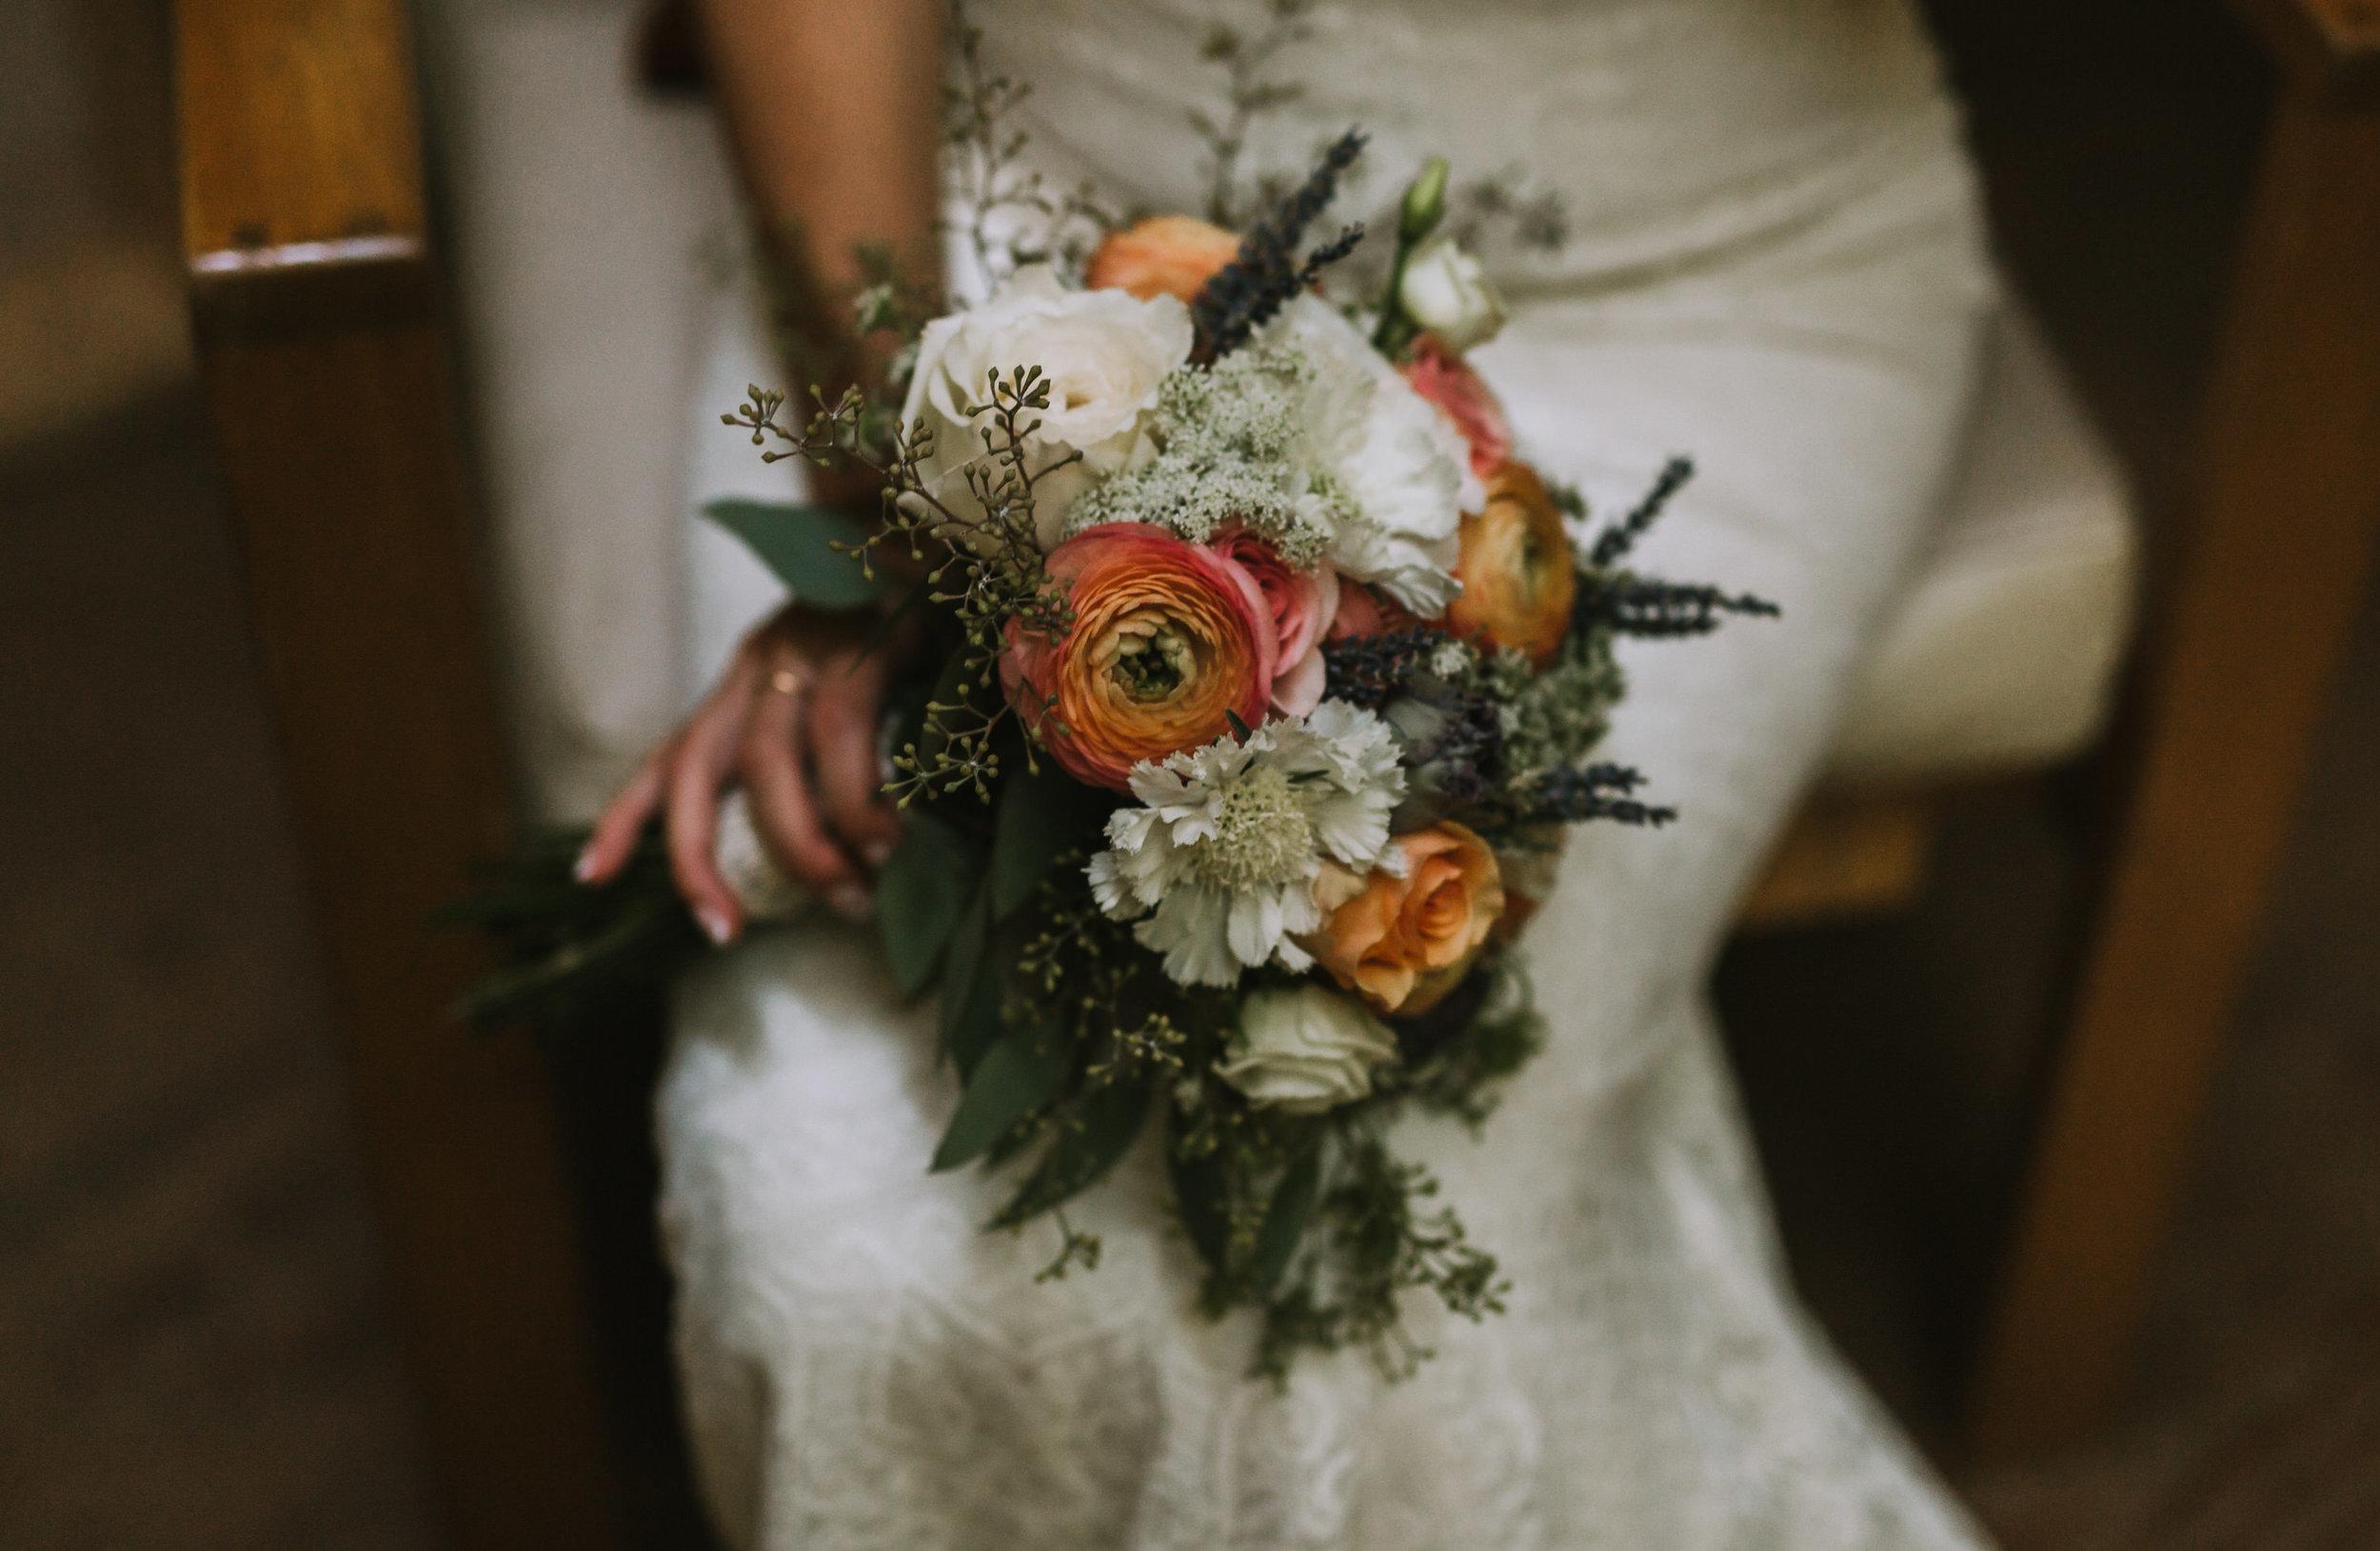 Camp Fircom Wedding - Vancouver Wedding Photographer & Videographer - Sunshine Coast Wedding Photos - Sunshine Coast Wedding Photographer - Jennifer Picard Photography - IMG_2018.jpg